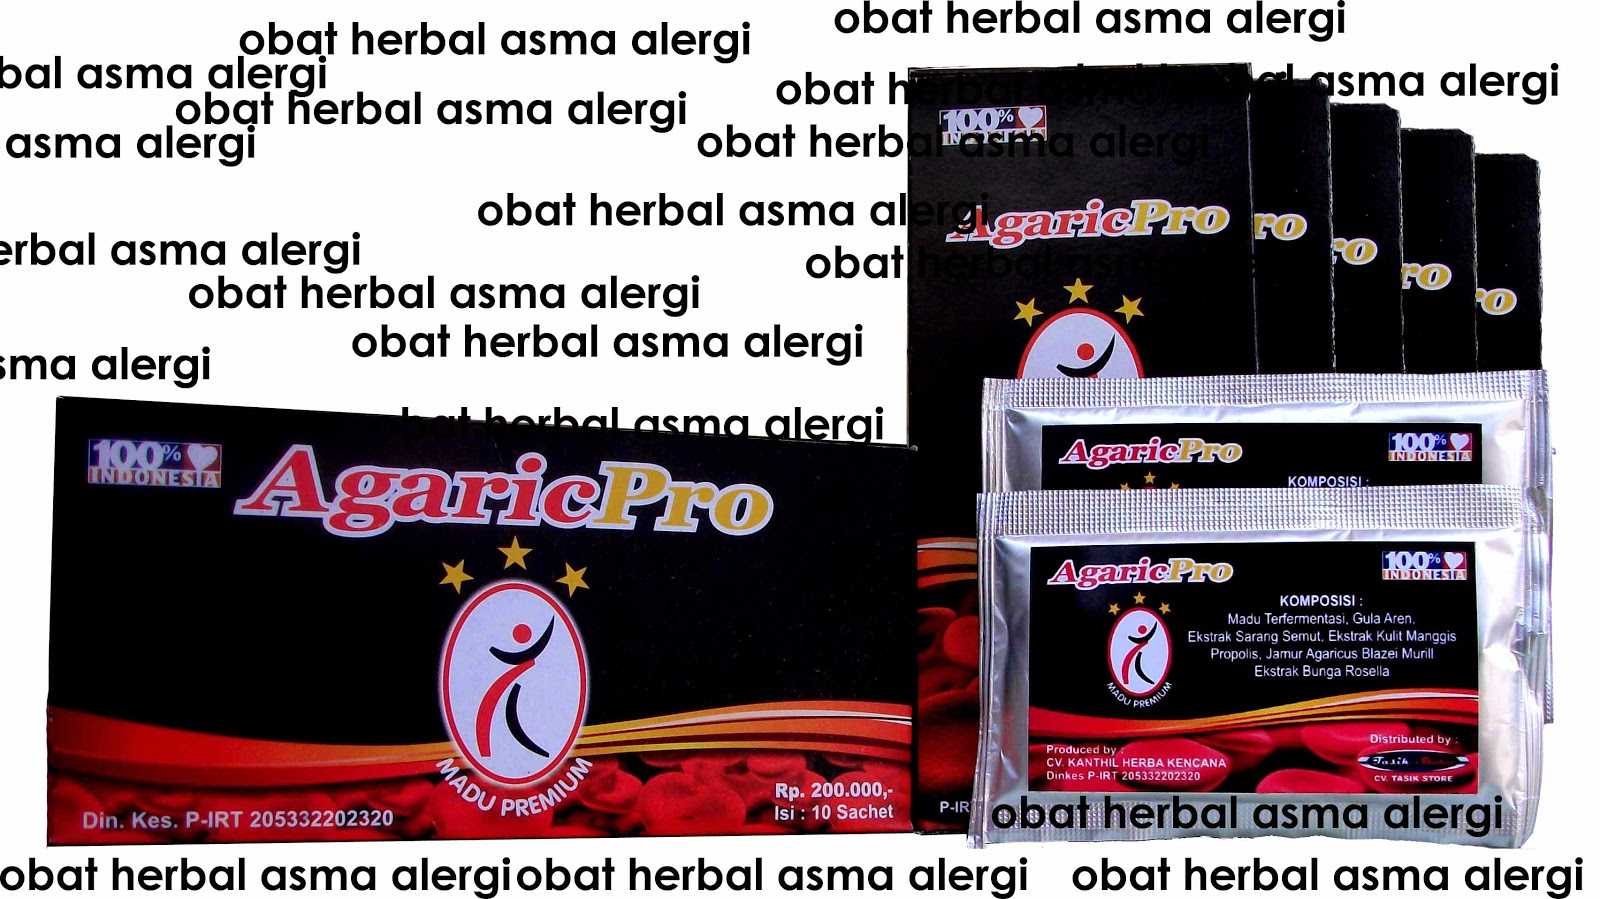 obat herbal asma alergi